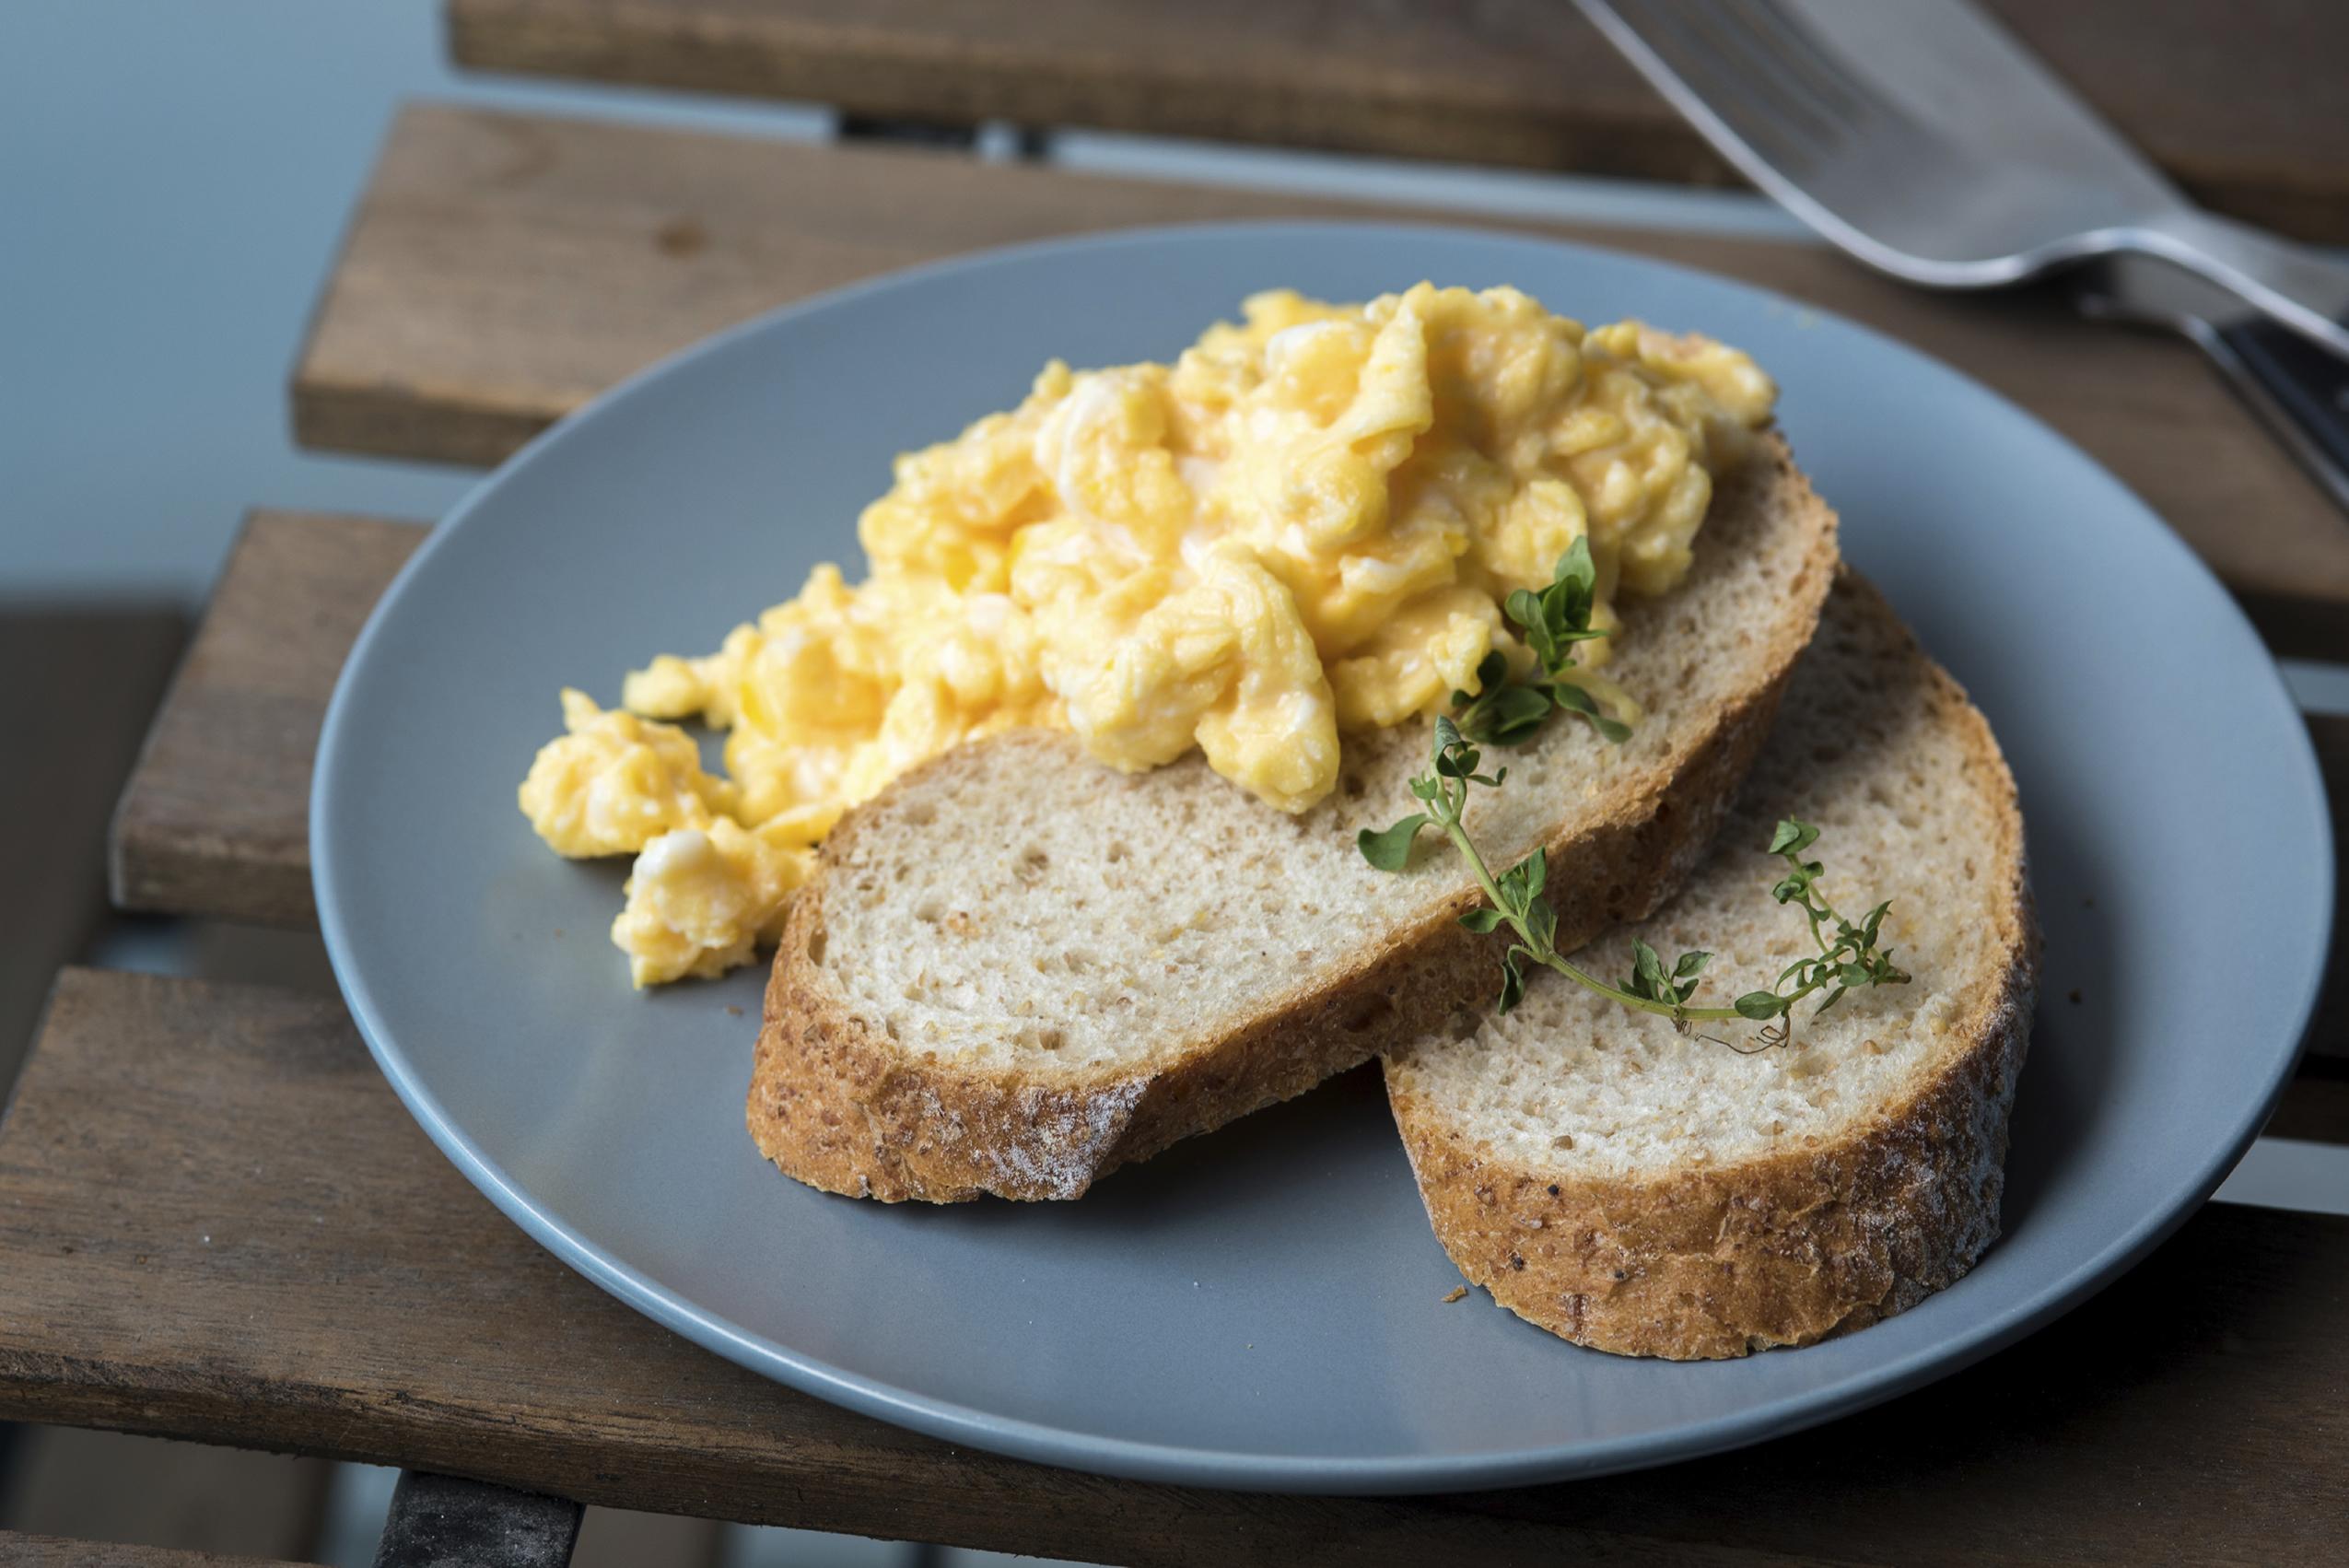 Huevo rayado en una tostada integral